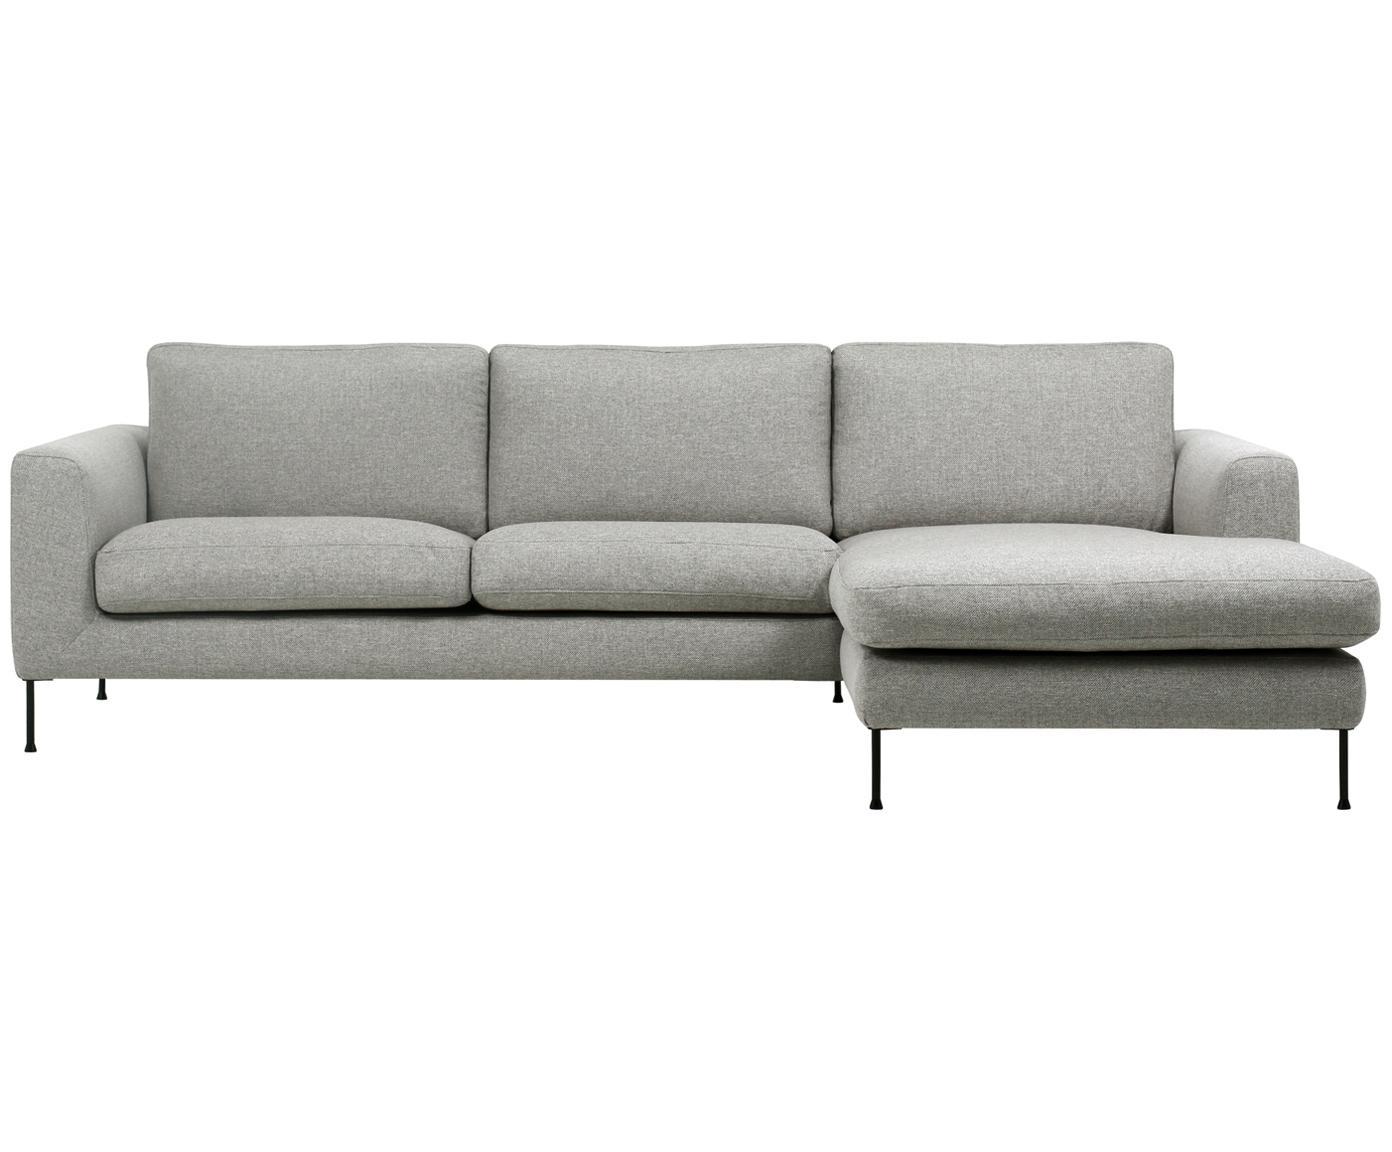 Hoekbank Cucita (3-zits), Bekleding: geweven stof (polyester), Frame: massief grenenhout, Poten: gelakt metaal, Lichtgrijs, B 262 x D 163 cm